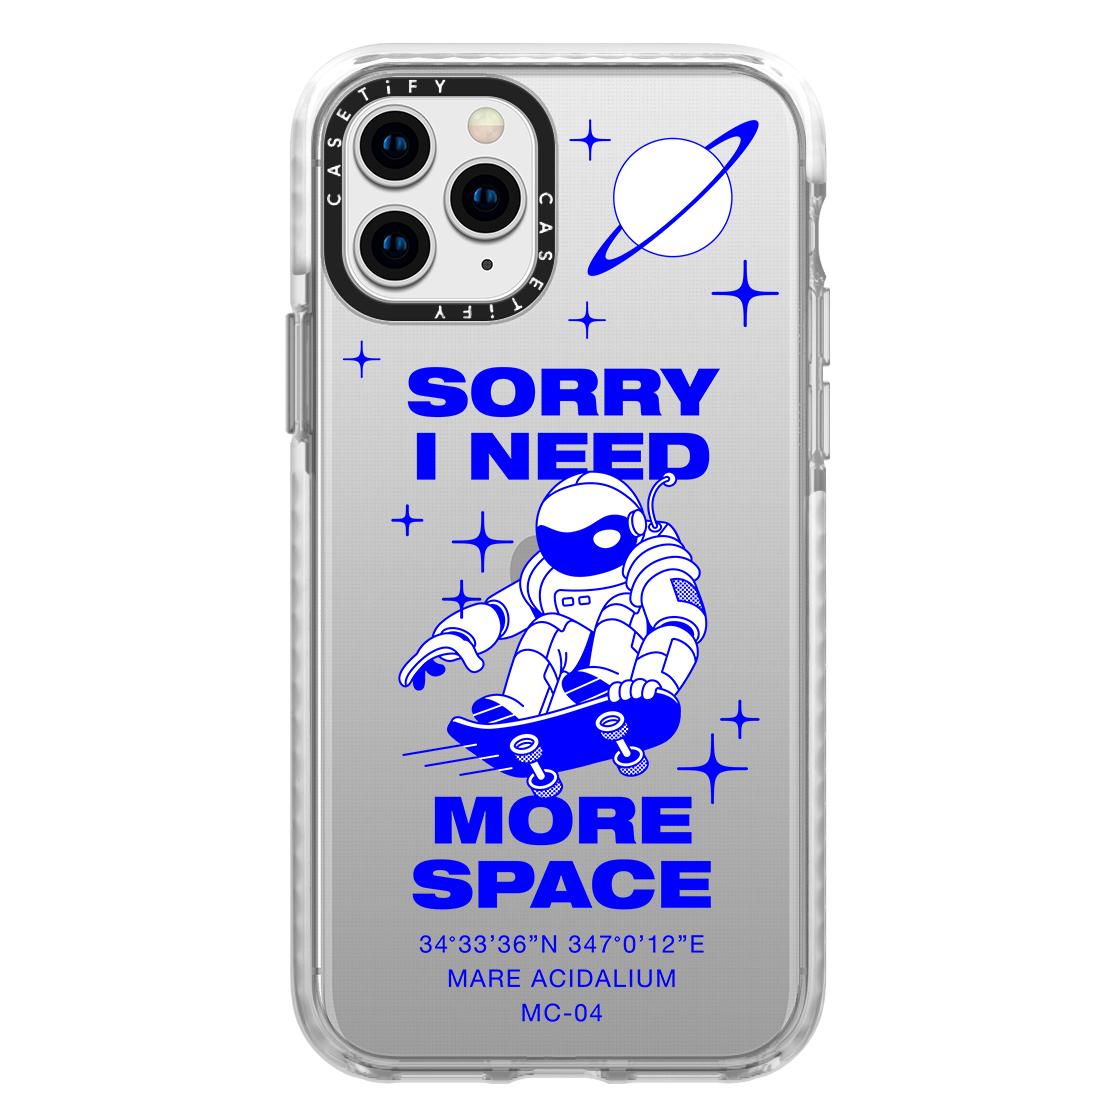 https://www.mpisano.com/wp-content/uploads/2020/12/morespace.jpg